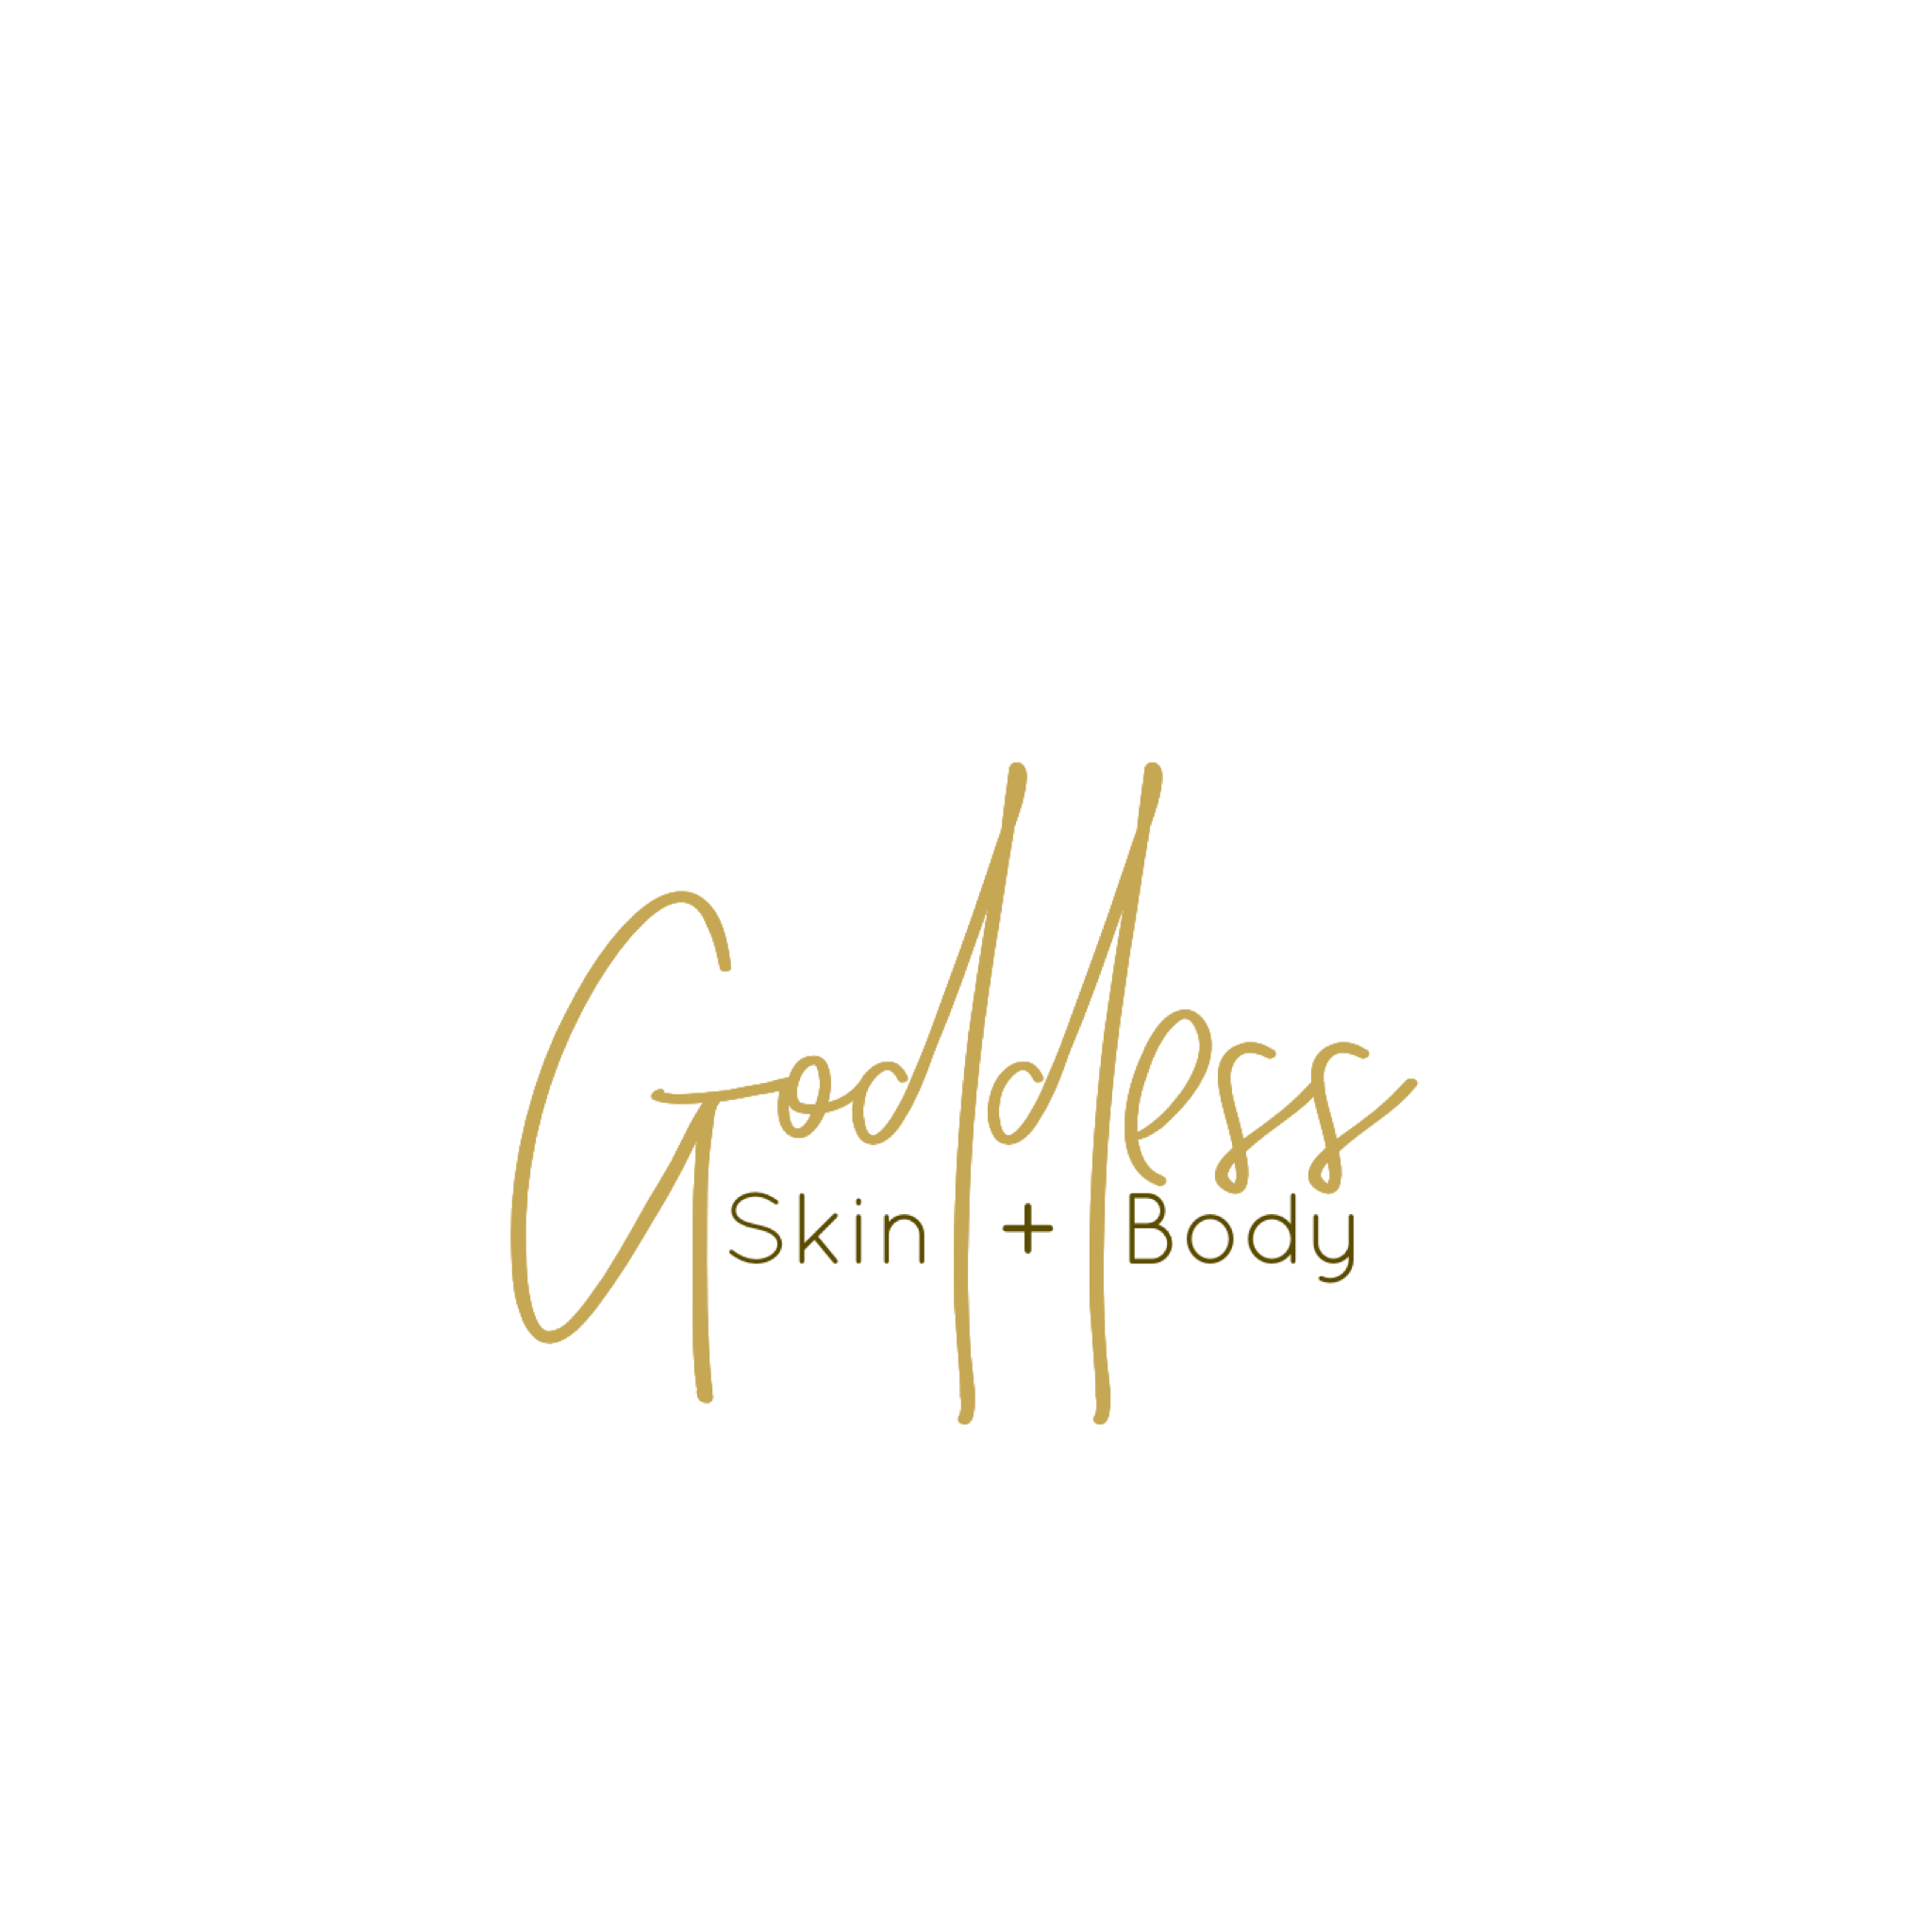 goddess logo.png